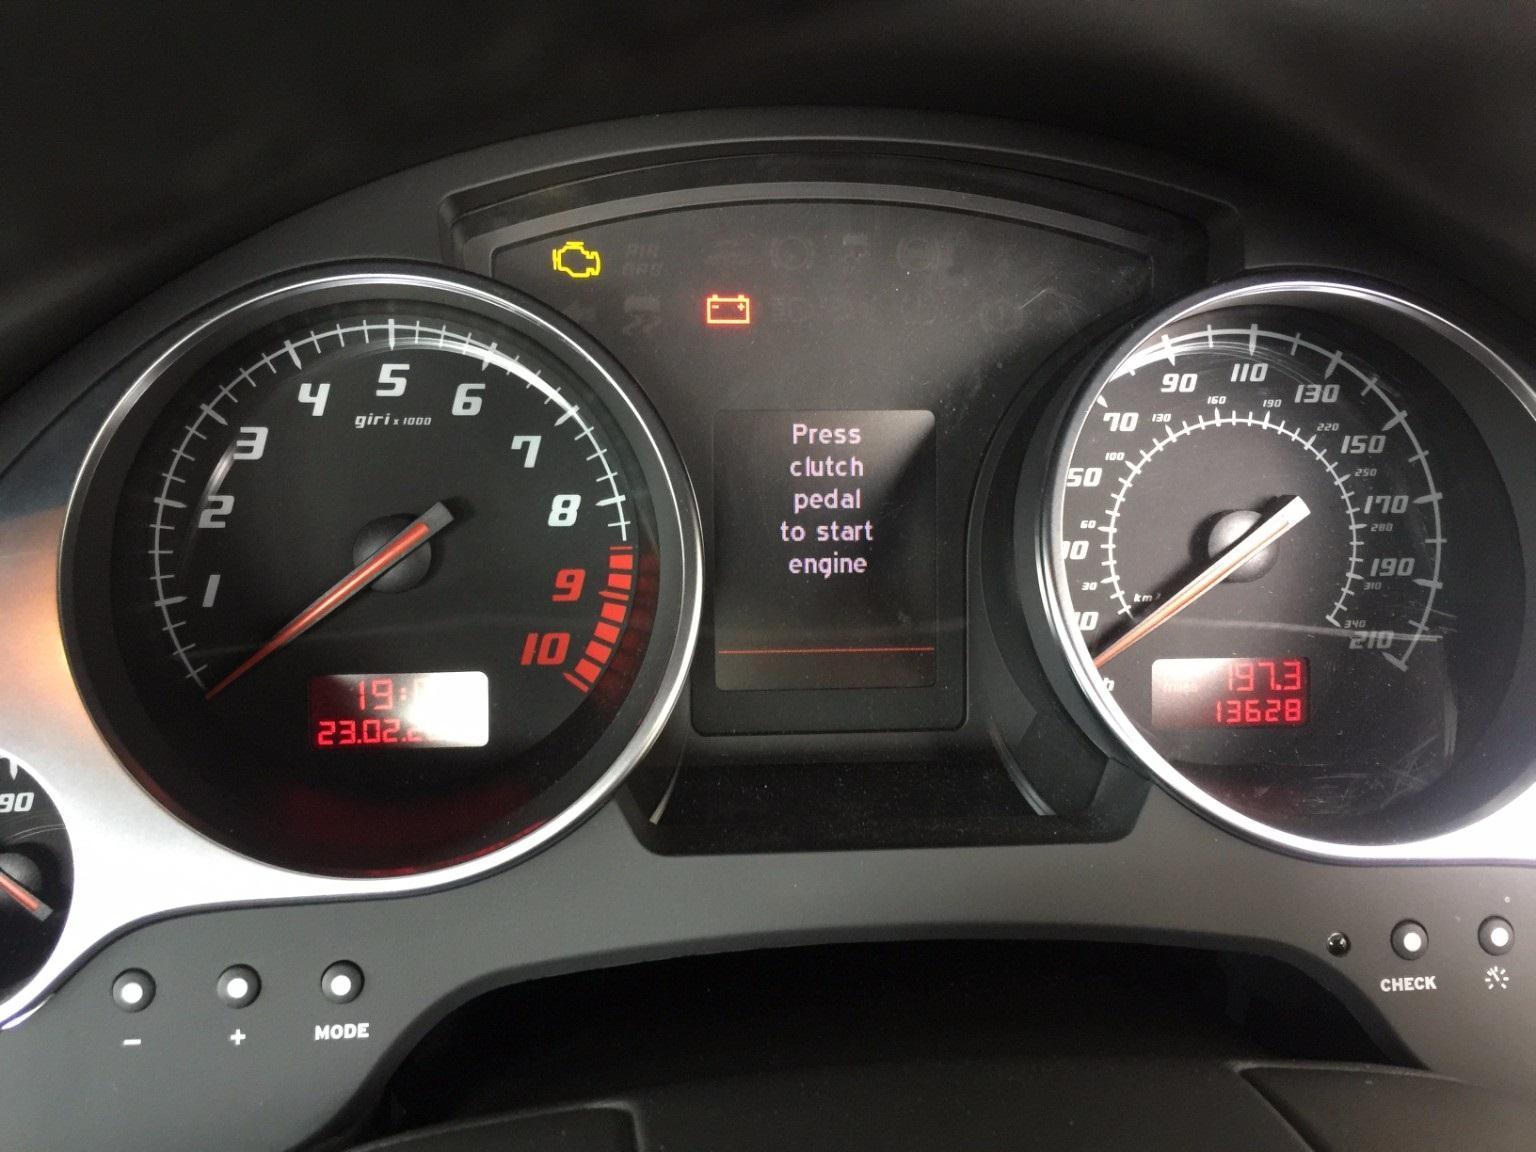 Used Lamborghini Gallardo V10 Coupe Balboni 550-2 for sale in Epsom, Surrey